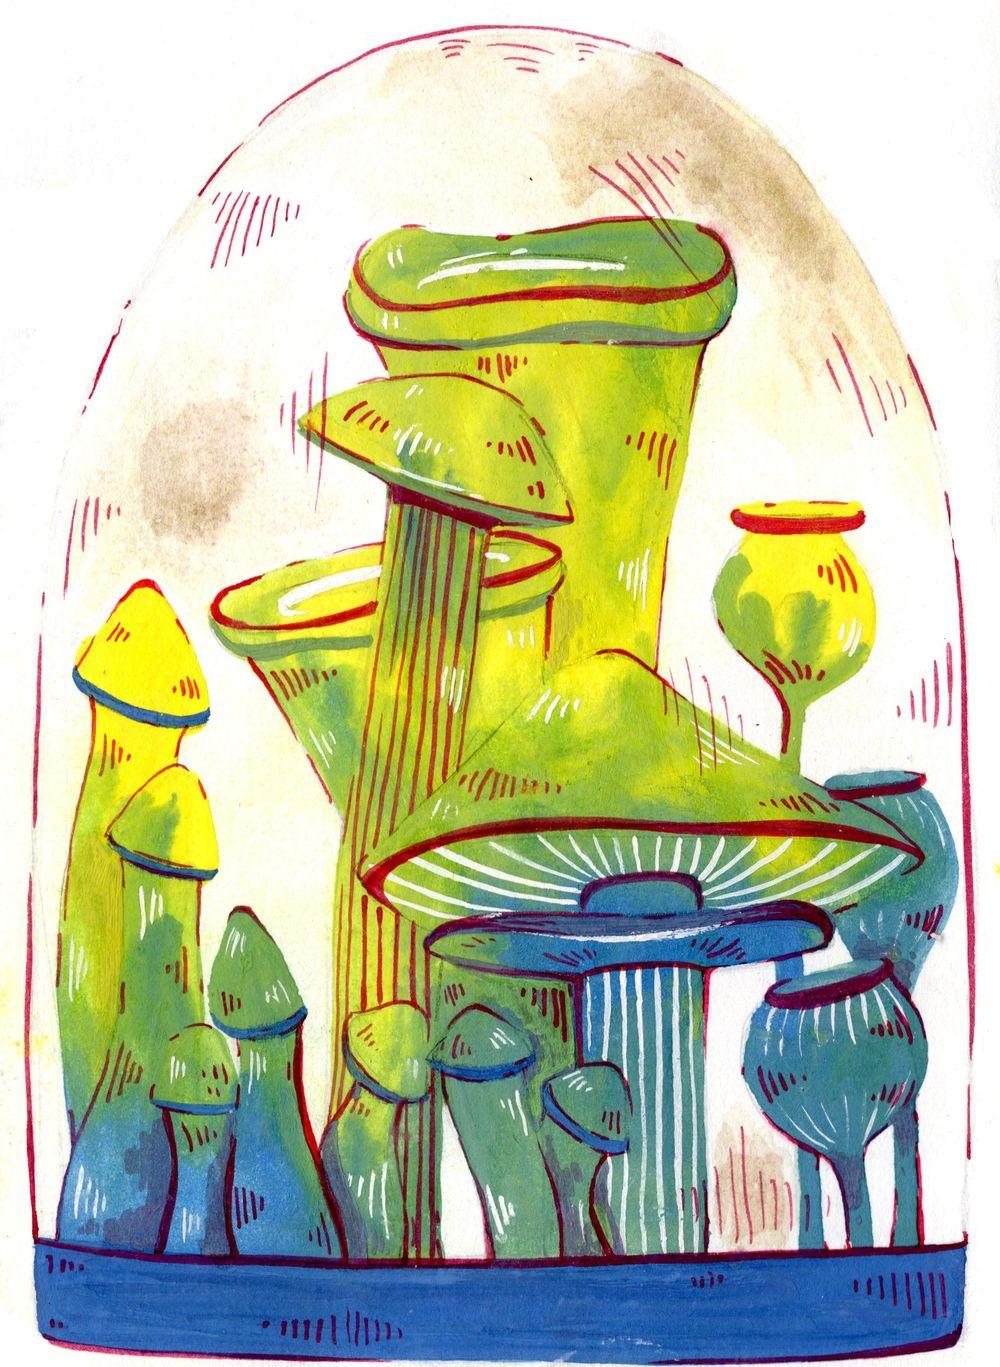 Mushrooms - image 2 - student project